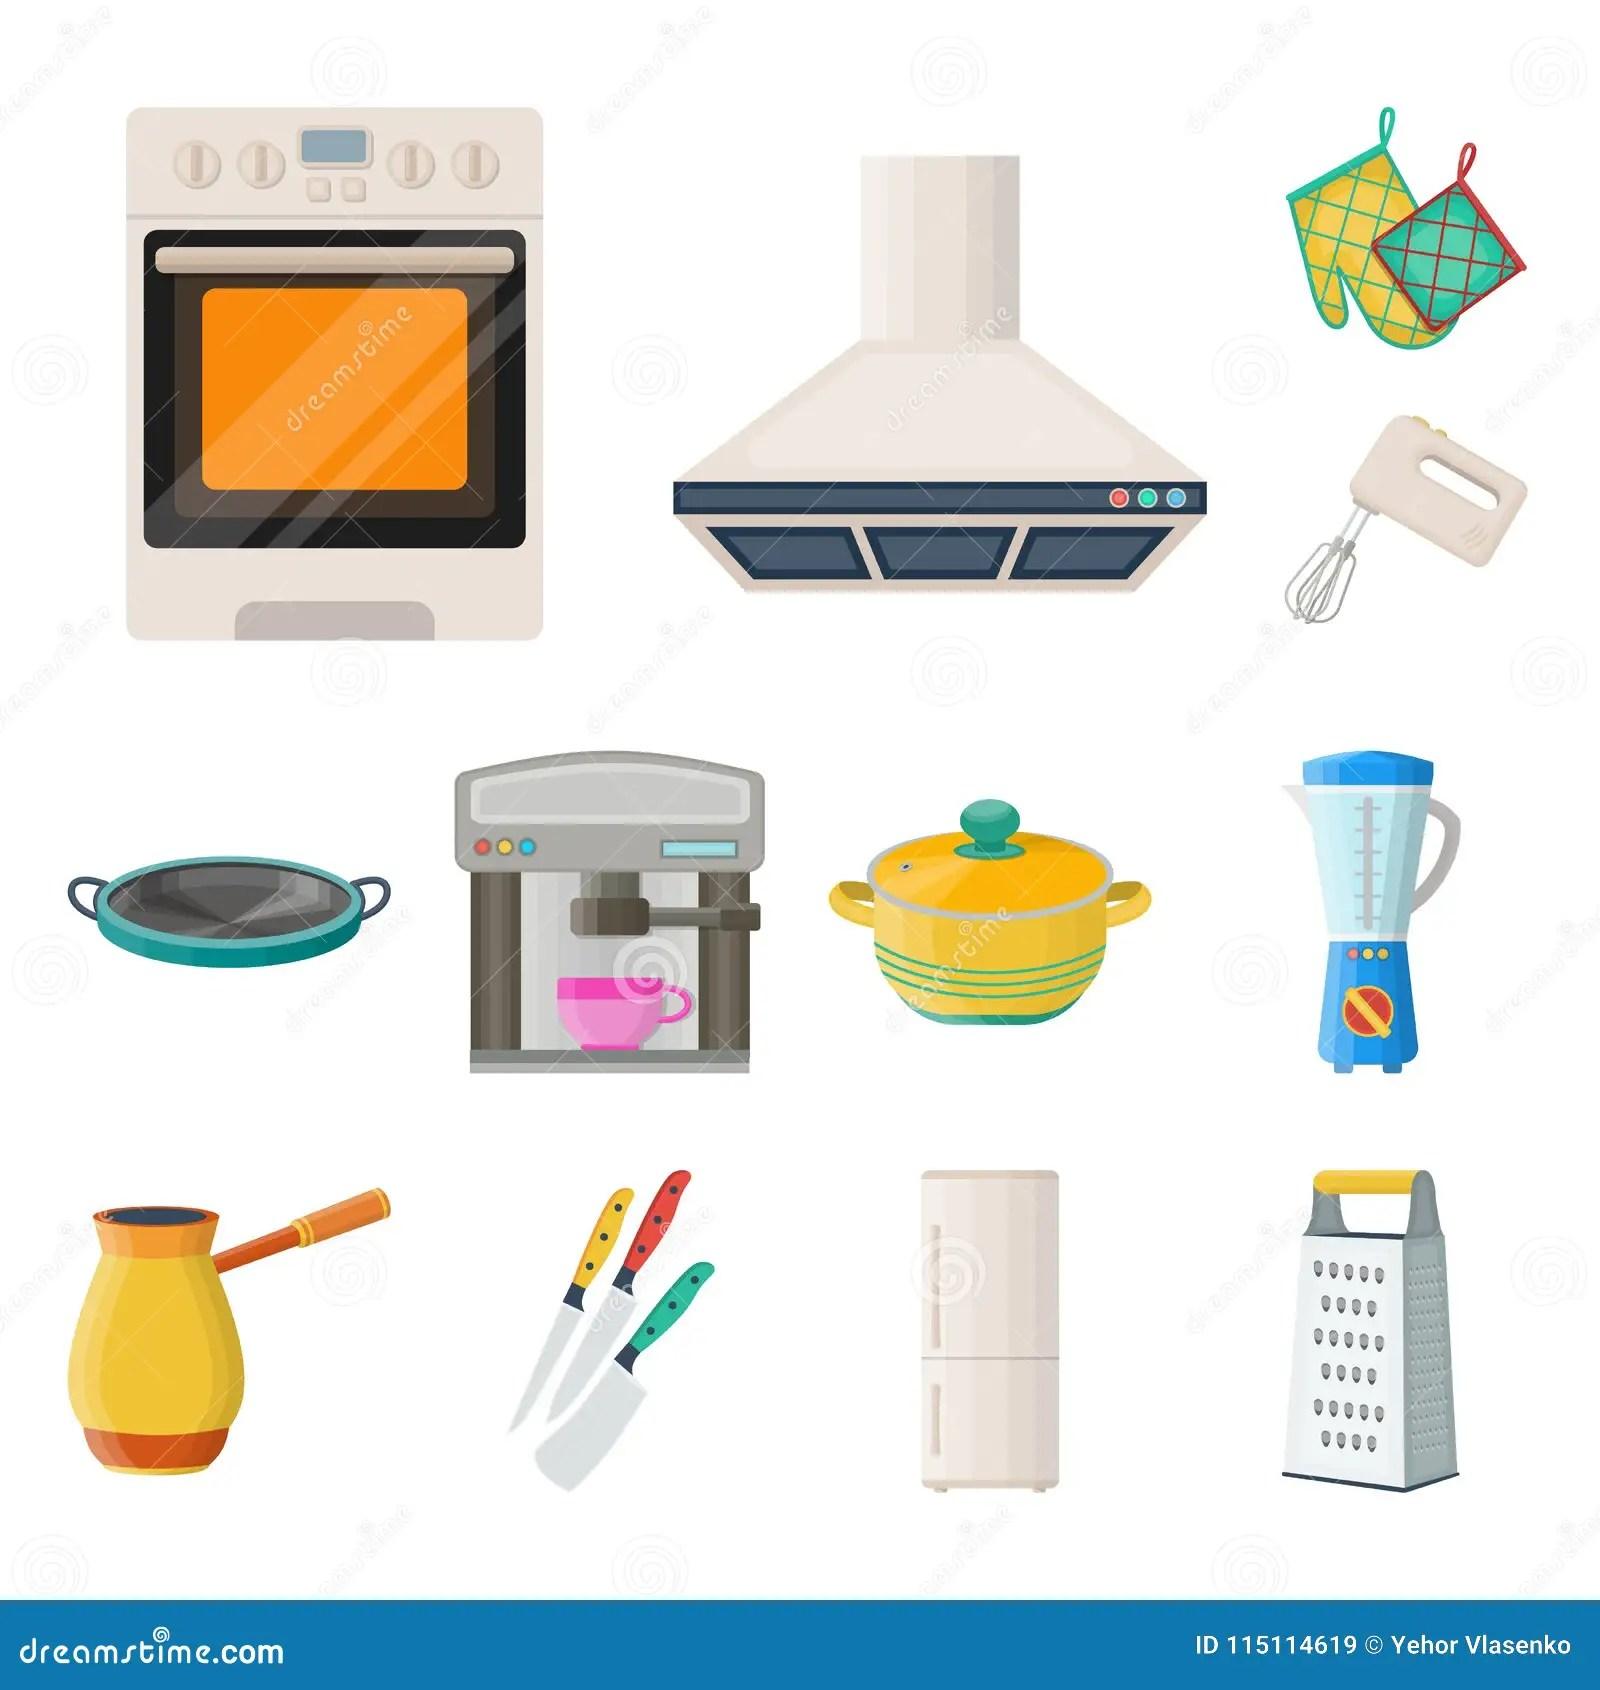 kitchen aid mixers remodeling your 厨房设备在集合汇集的动画片象的设计厨房和辅助部件传染媒介标志股票网 厨房设备在集合汇集的动画片象的设计厨房和辅助部件传染媒介标志股票例证